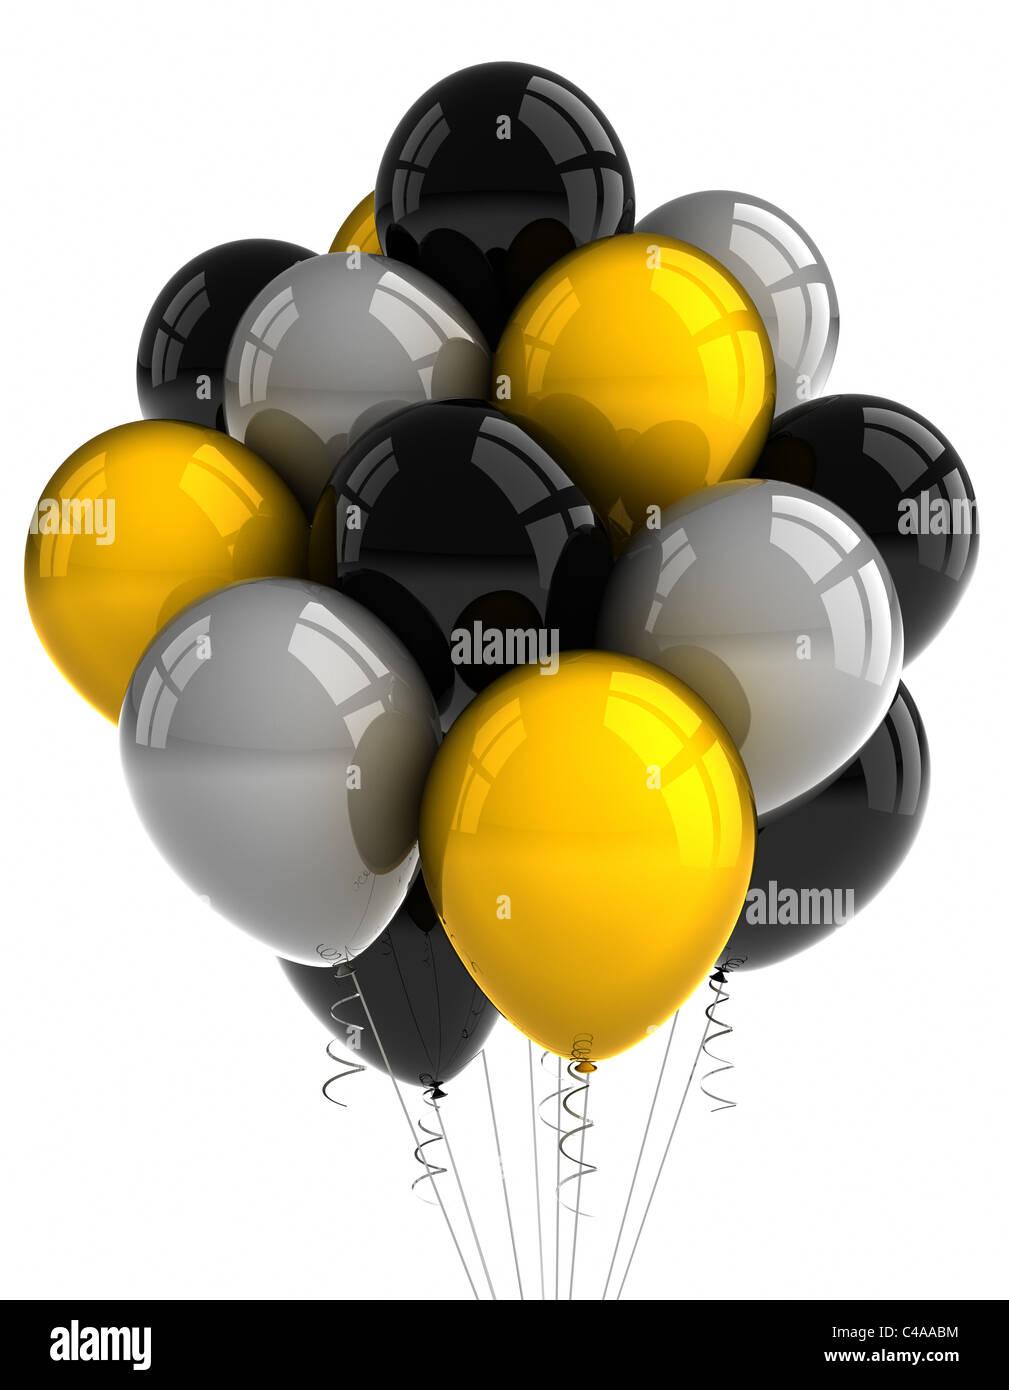 Parte globos sobre fondo blanco. Foto de stock